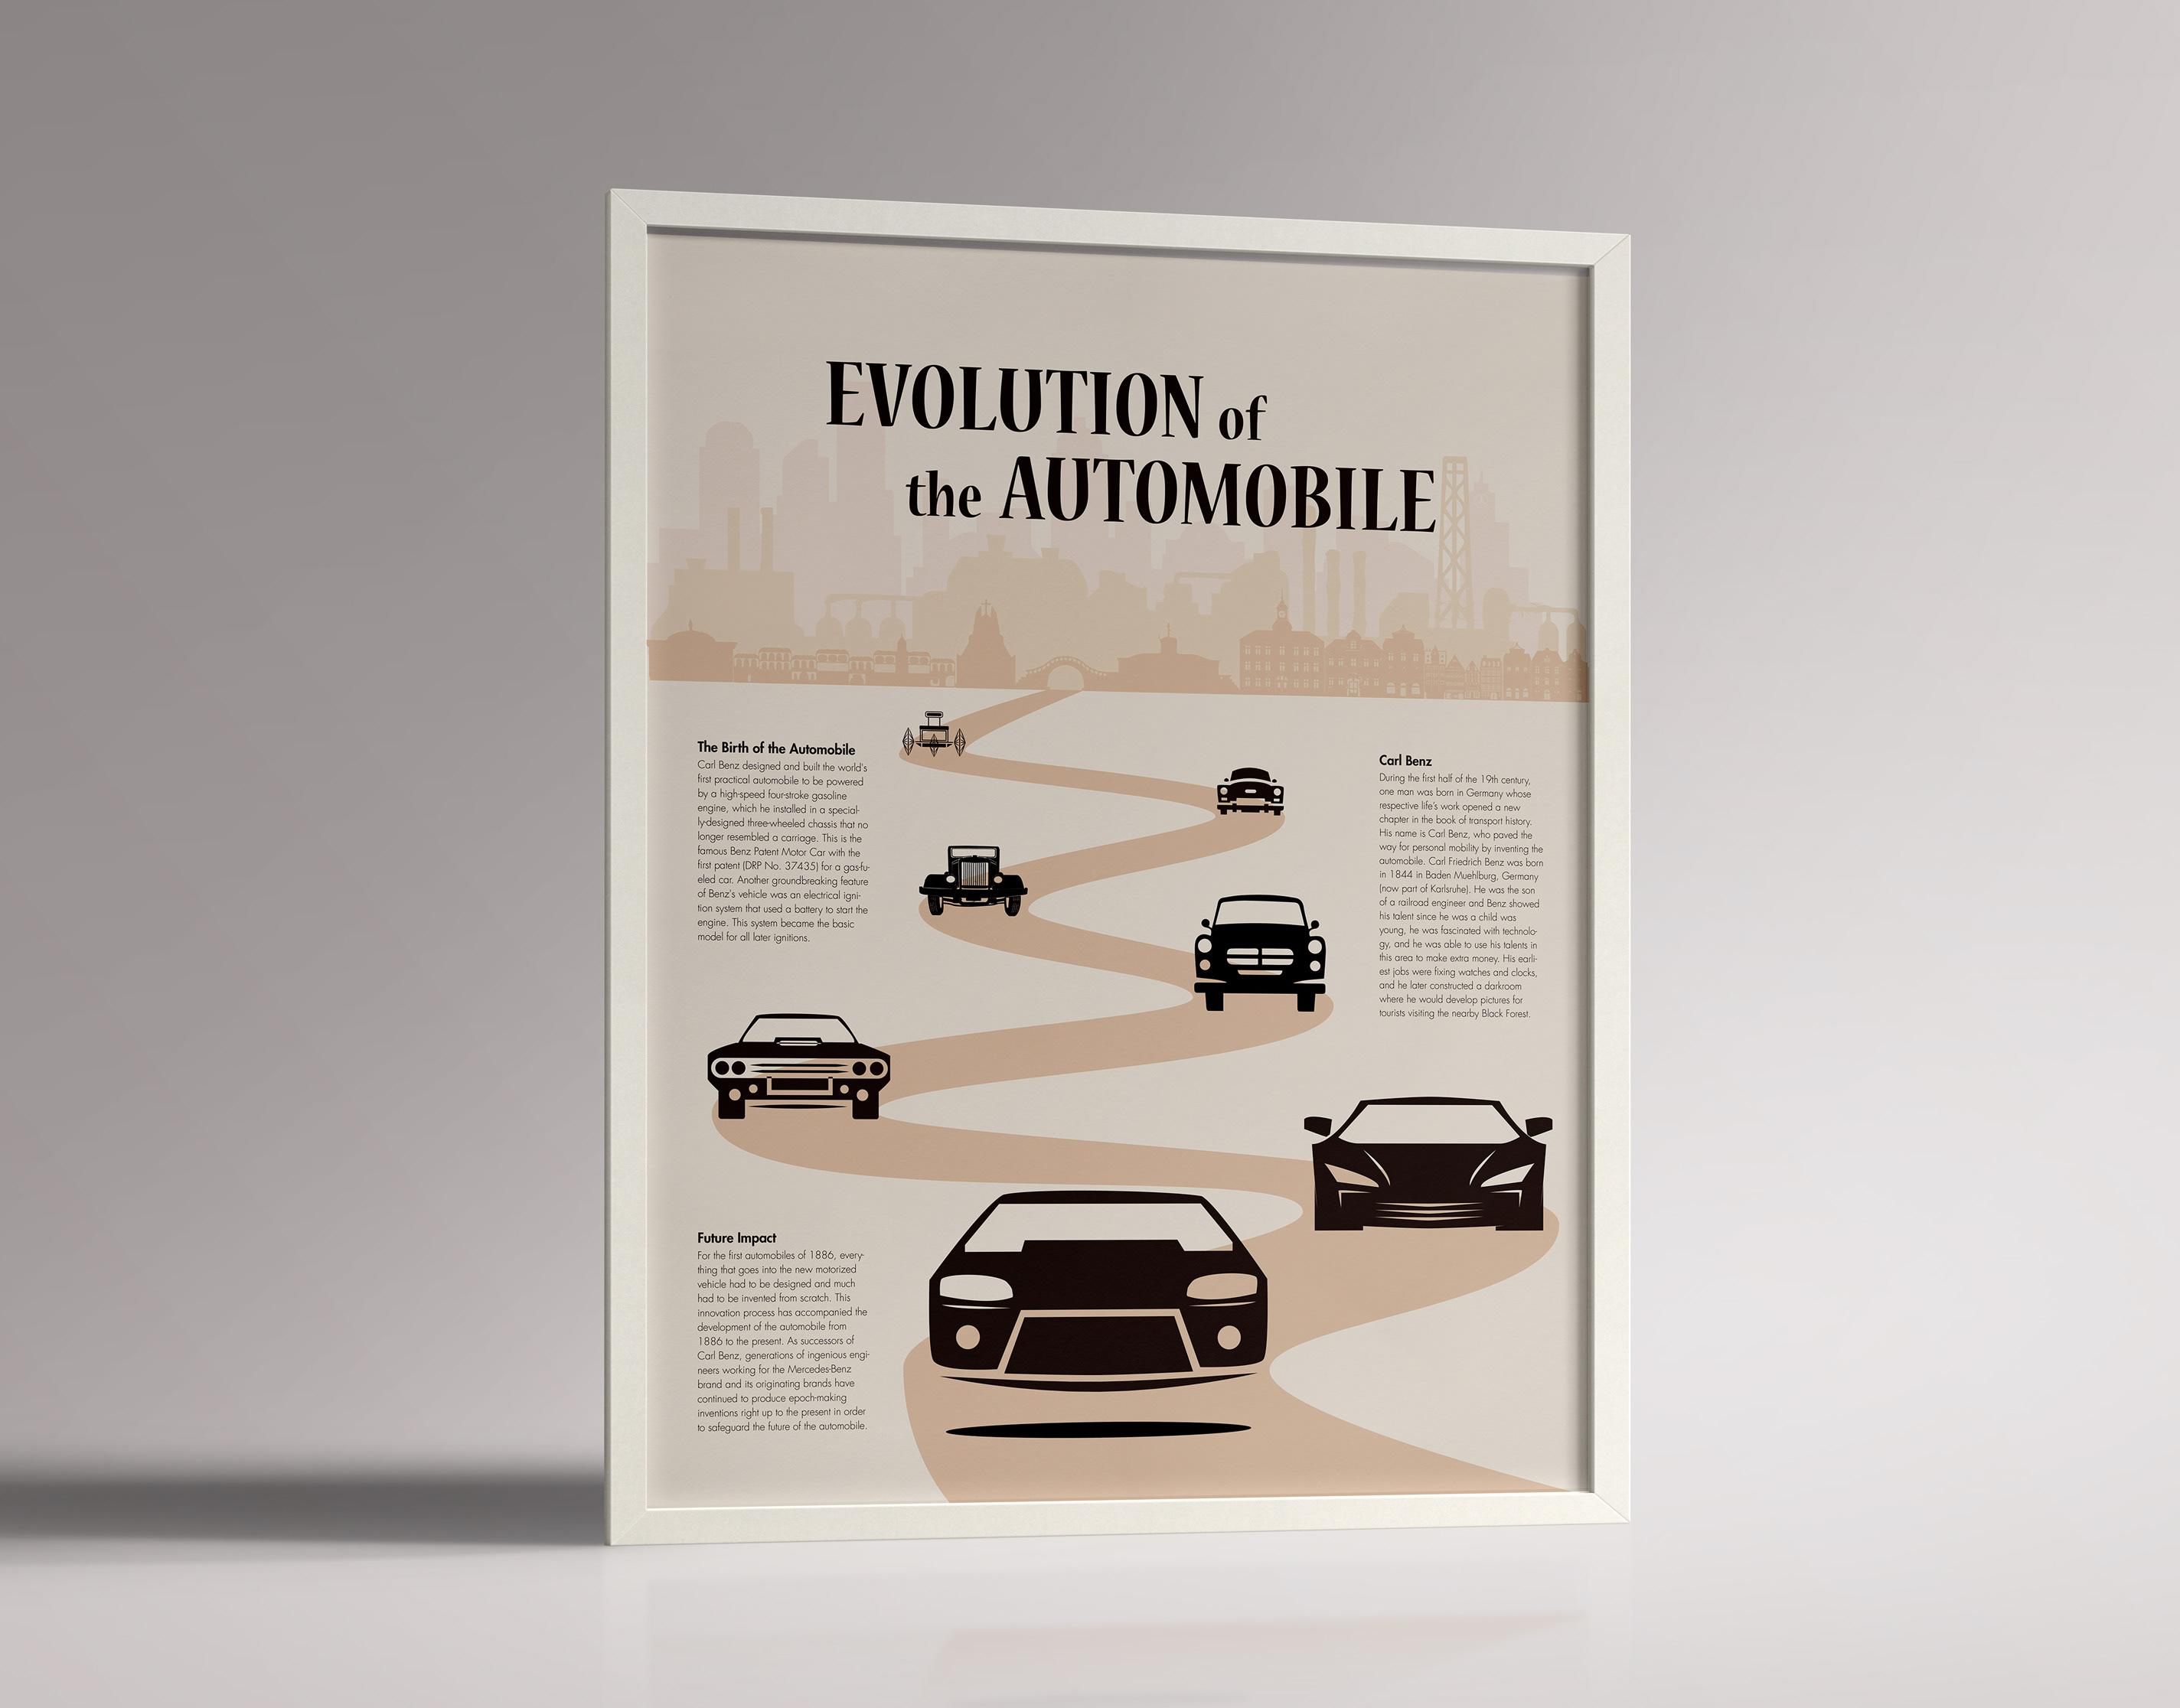 Bohao Zhang - Evolution of the Automobile